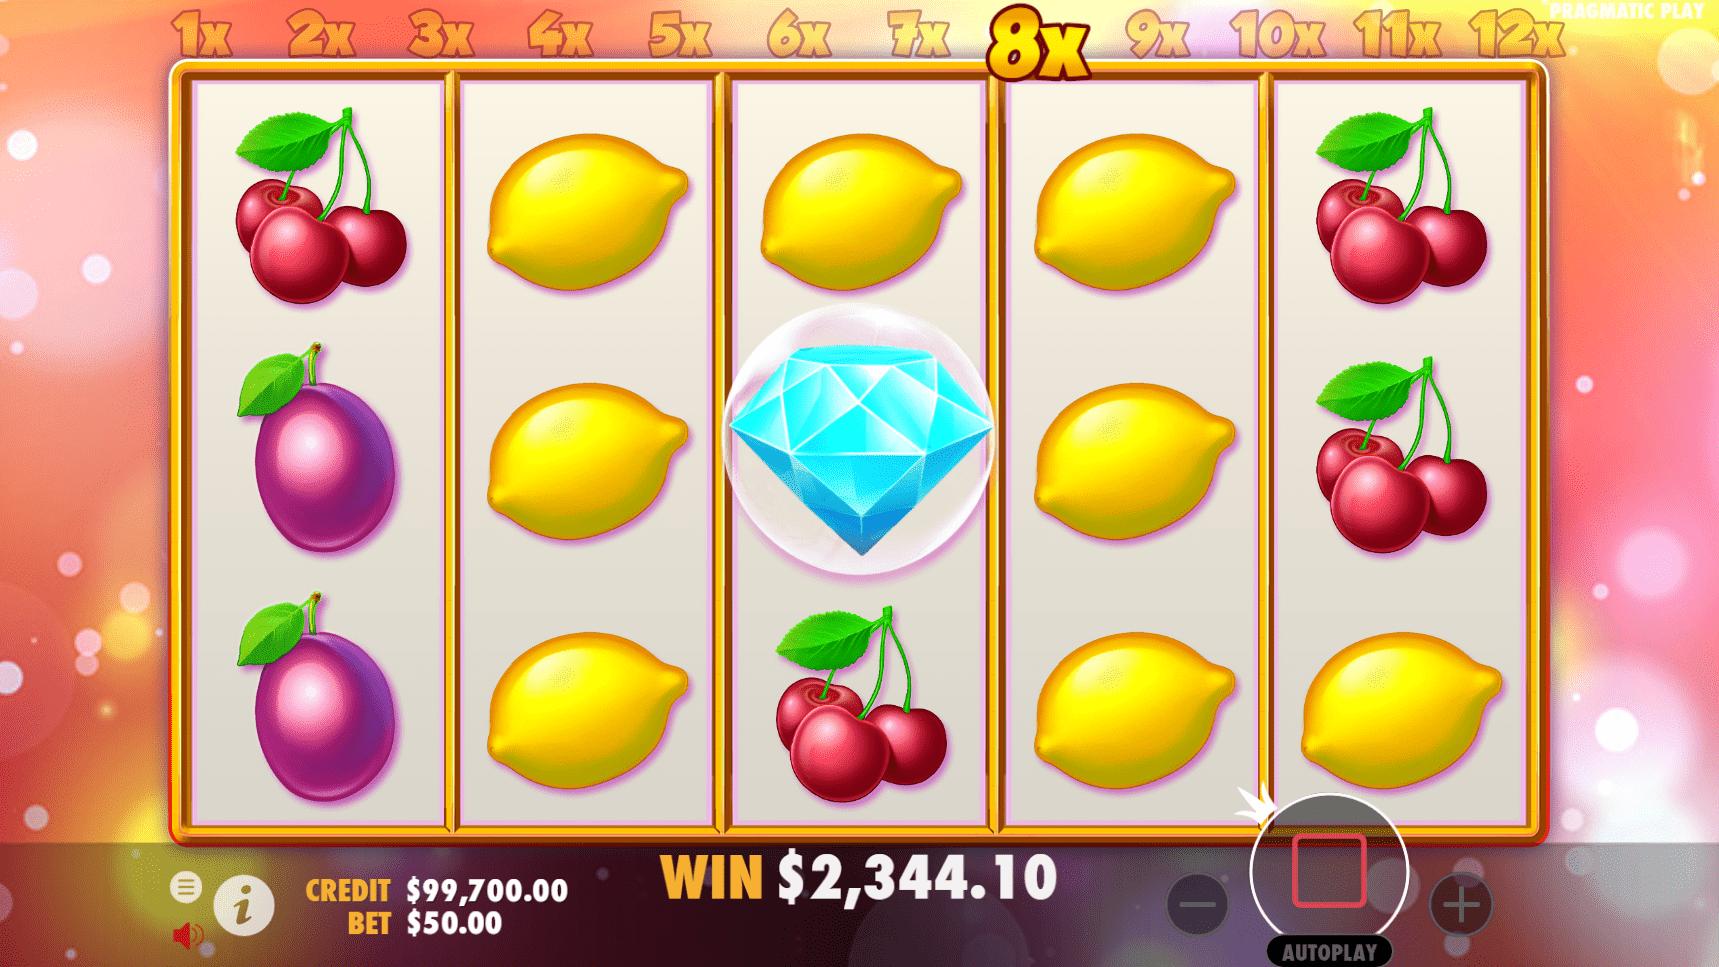 Extra Juicy - Pragmatic Play online slot